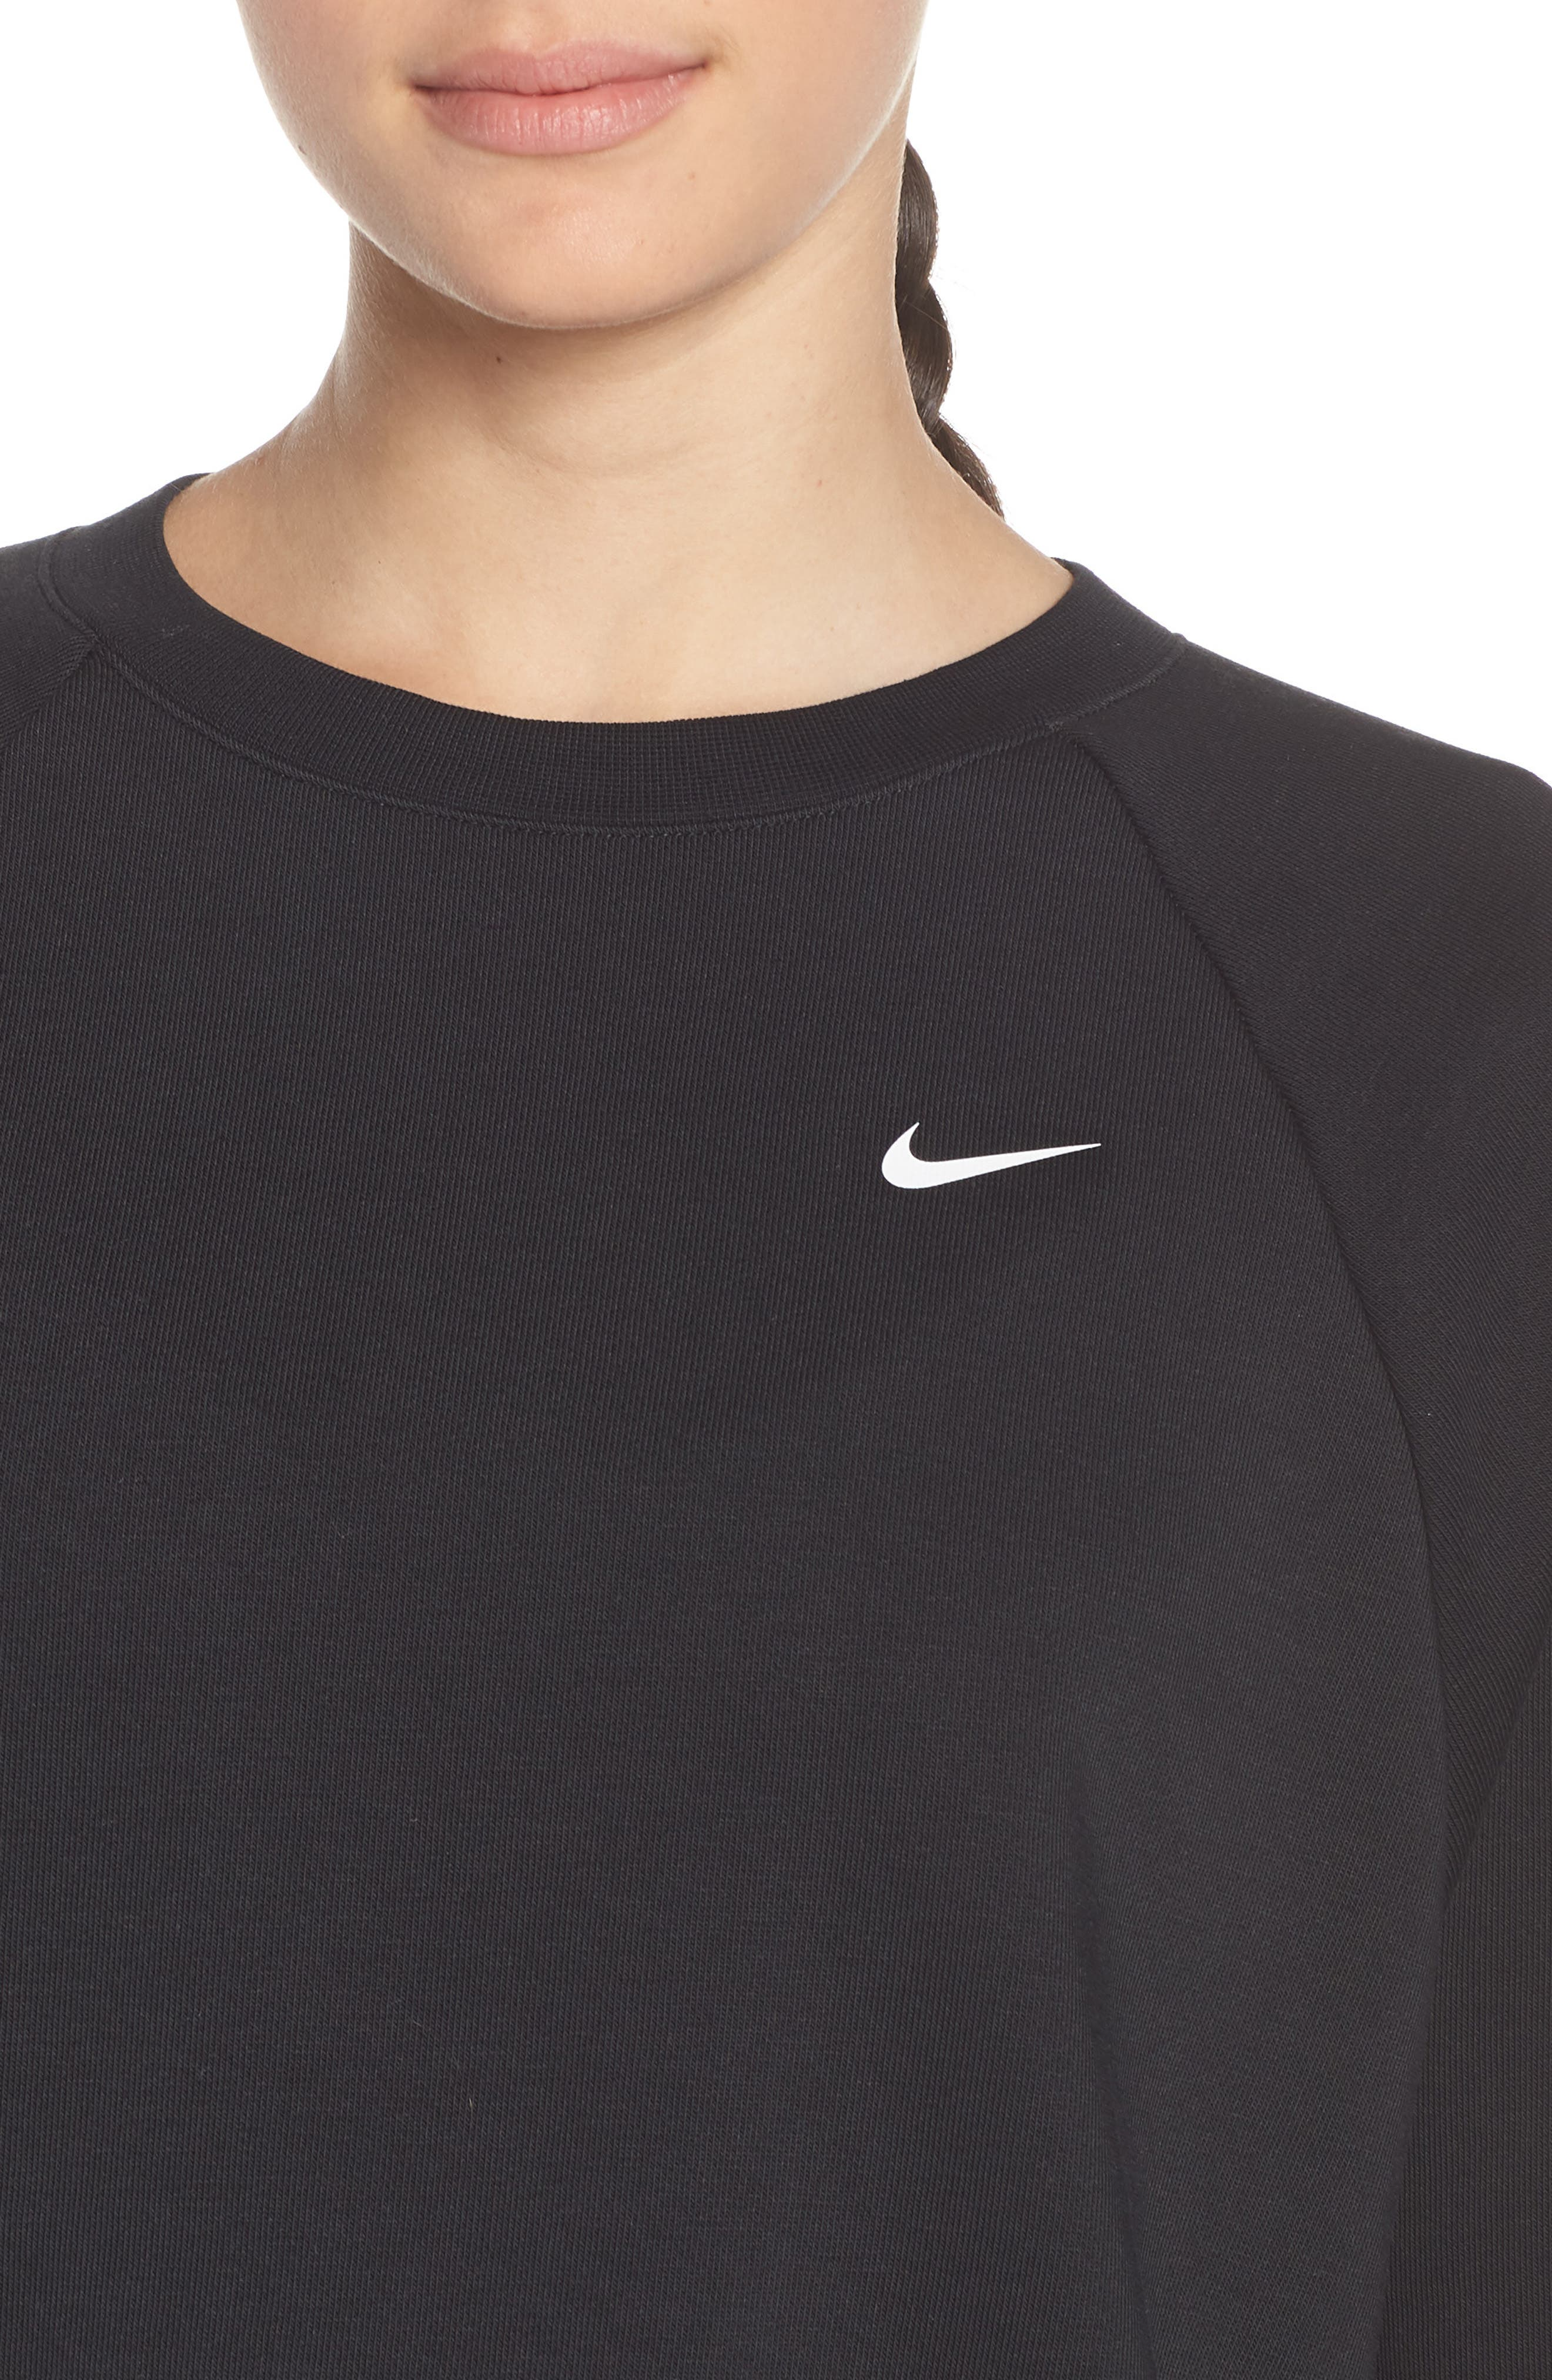 NIKE, Dry Cropped Training Sweatshirt, Alternate thumbnail 5, color, BLACK/ WHITE